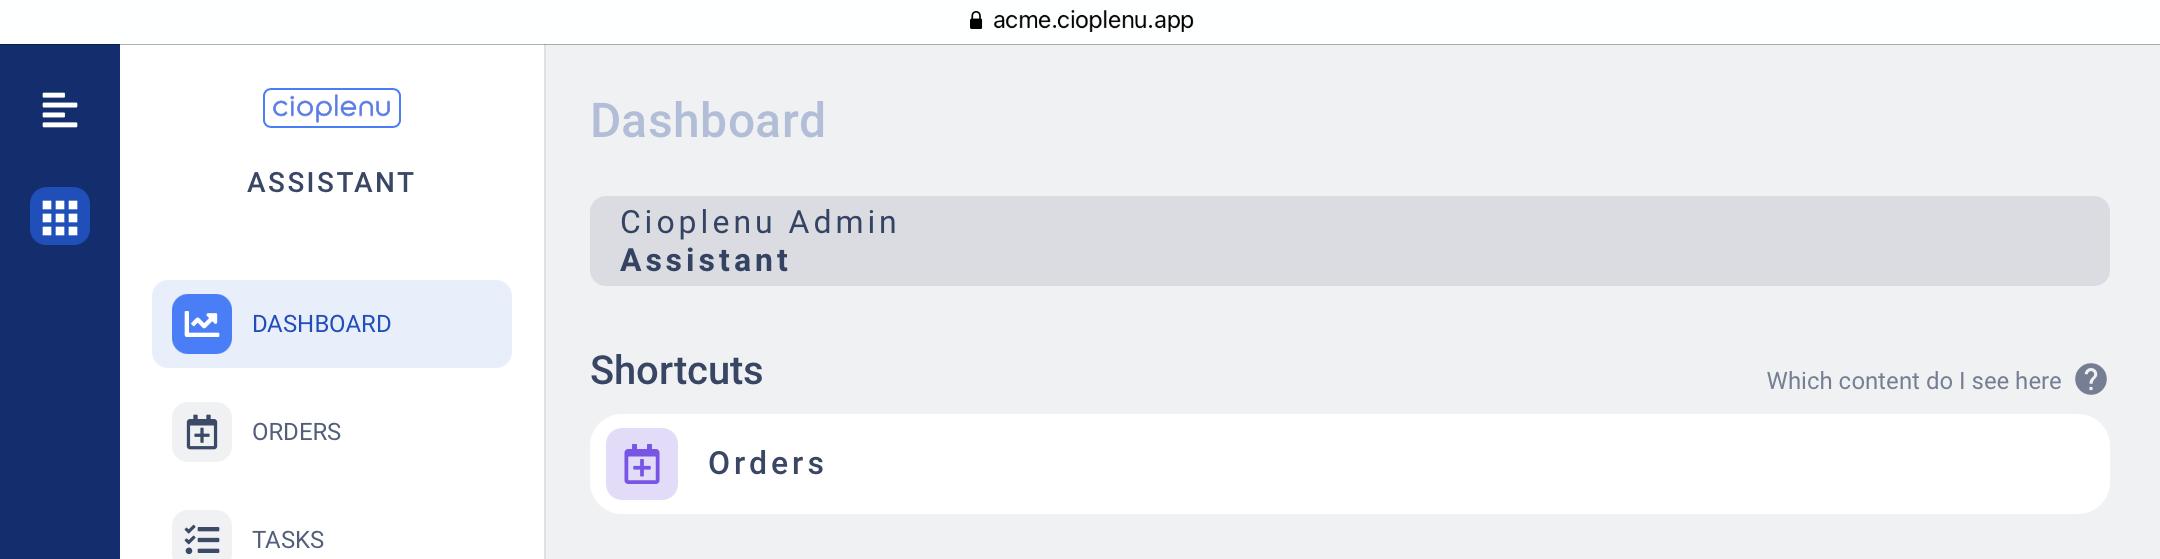 iOS Safari Symbolleiste ausgeblendet